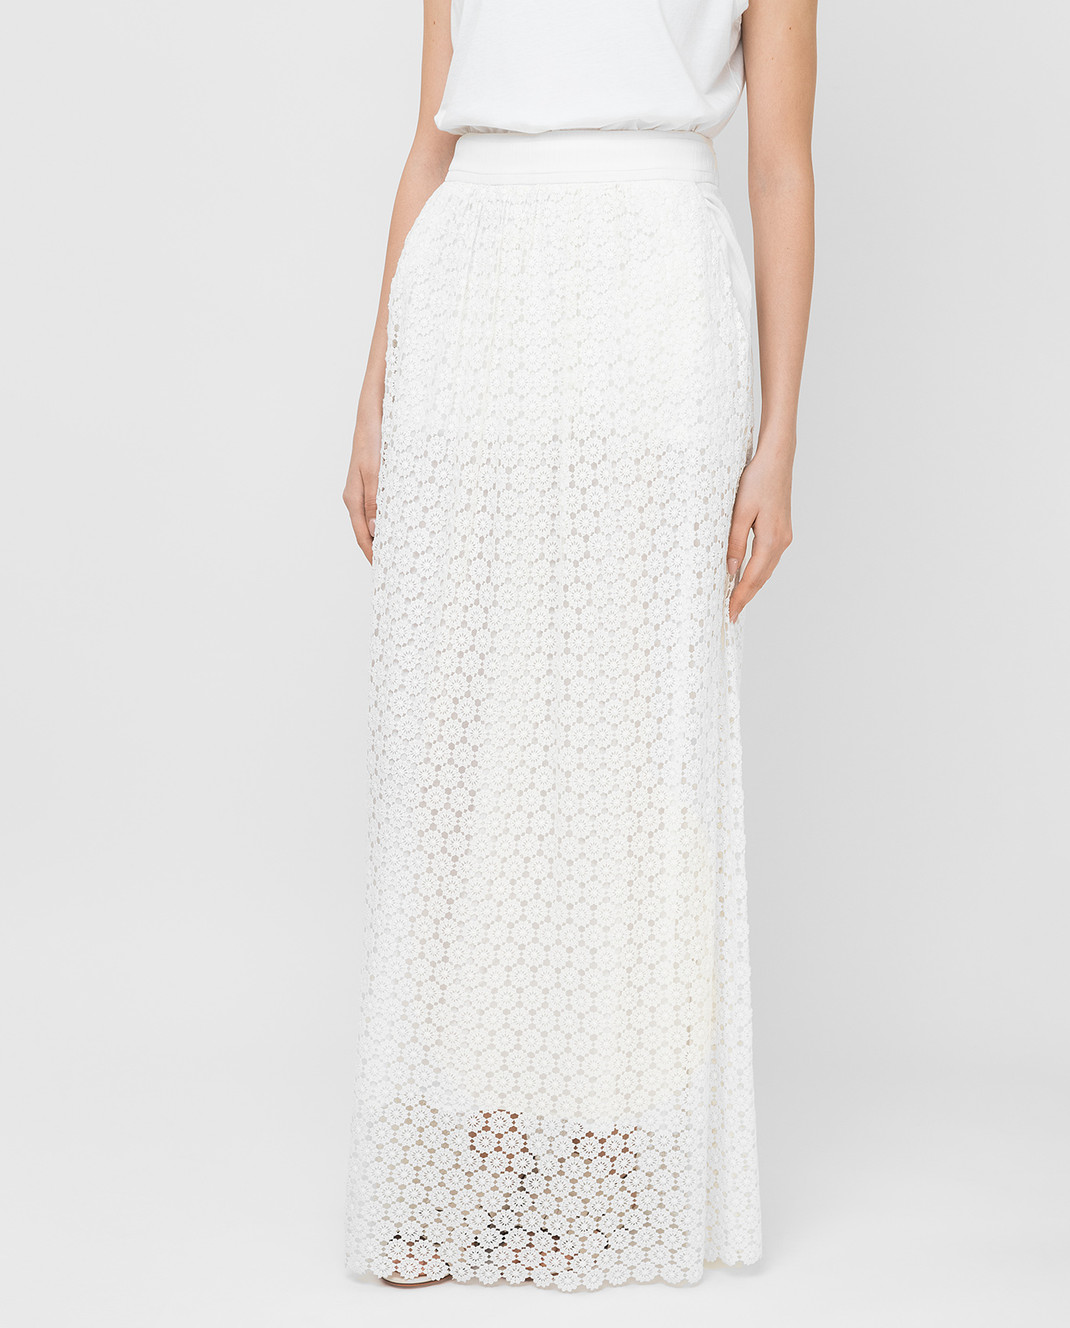 Veronique Branquinho Белая юбка VPG101AVG151A изображение 3